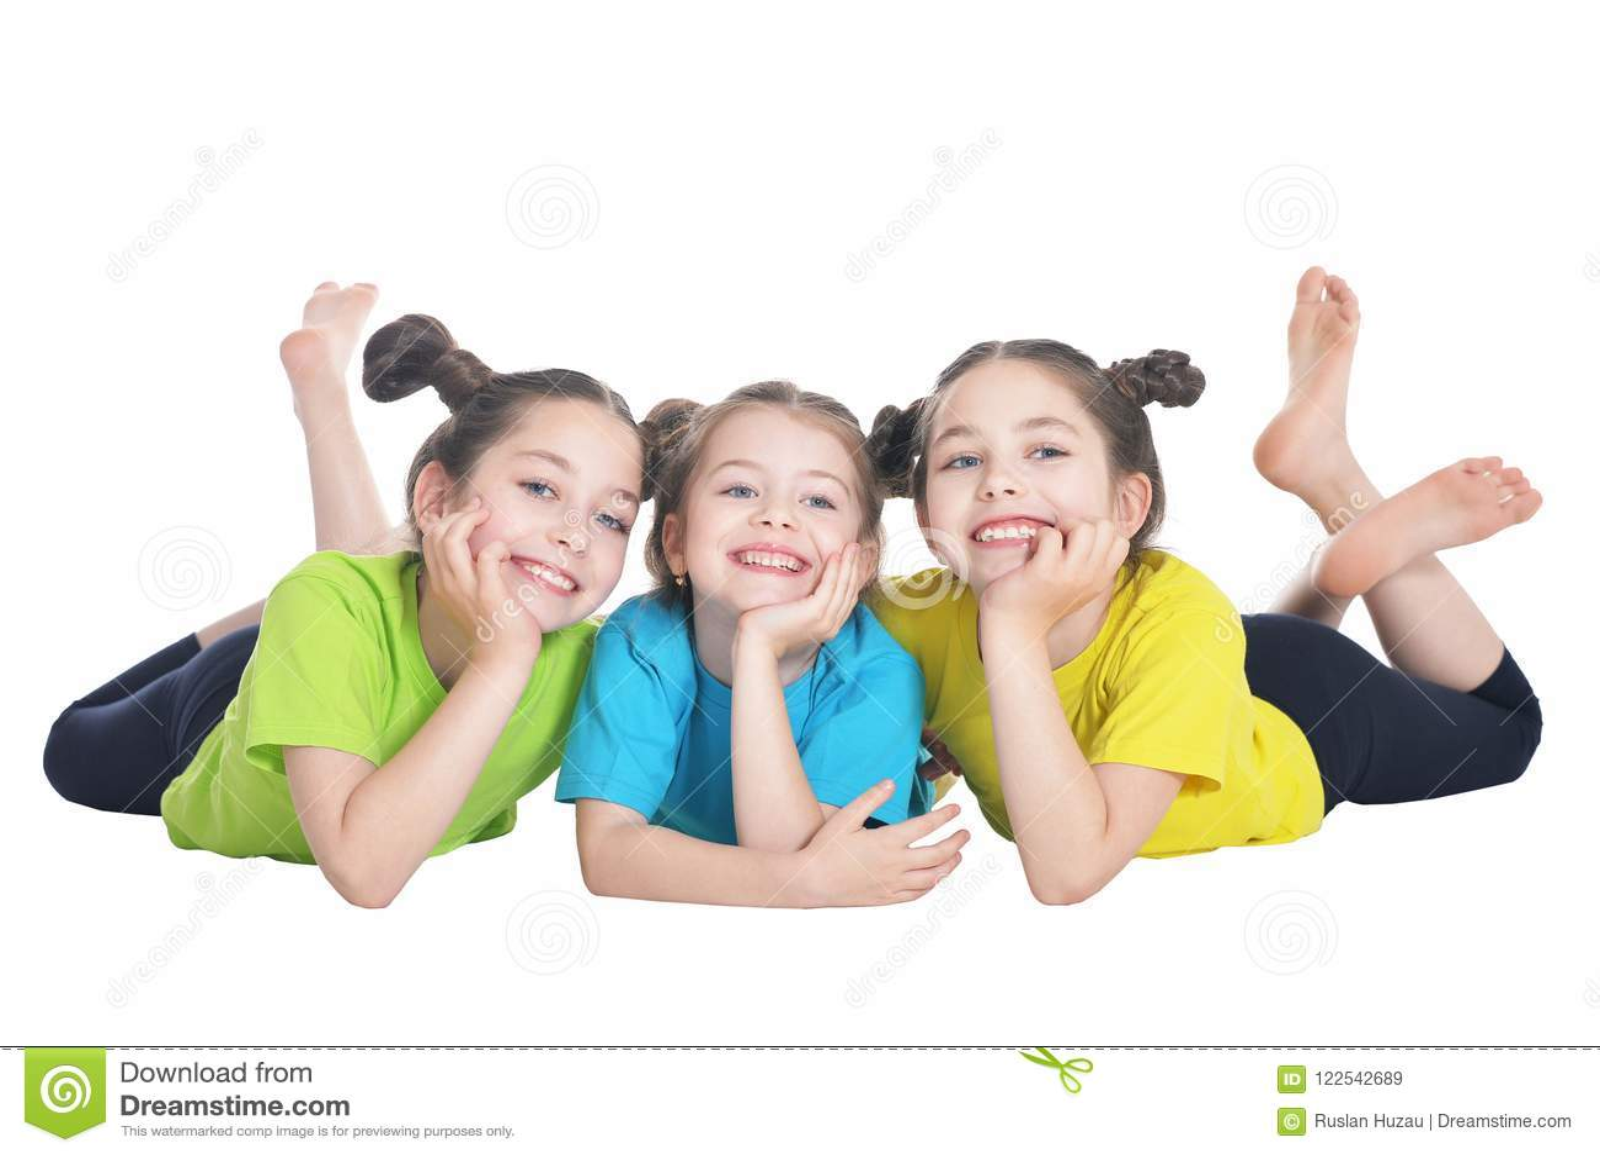 Tweenie boy and girls